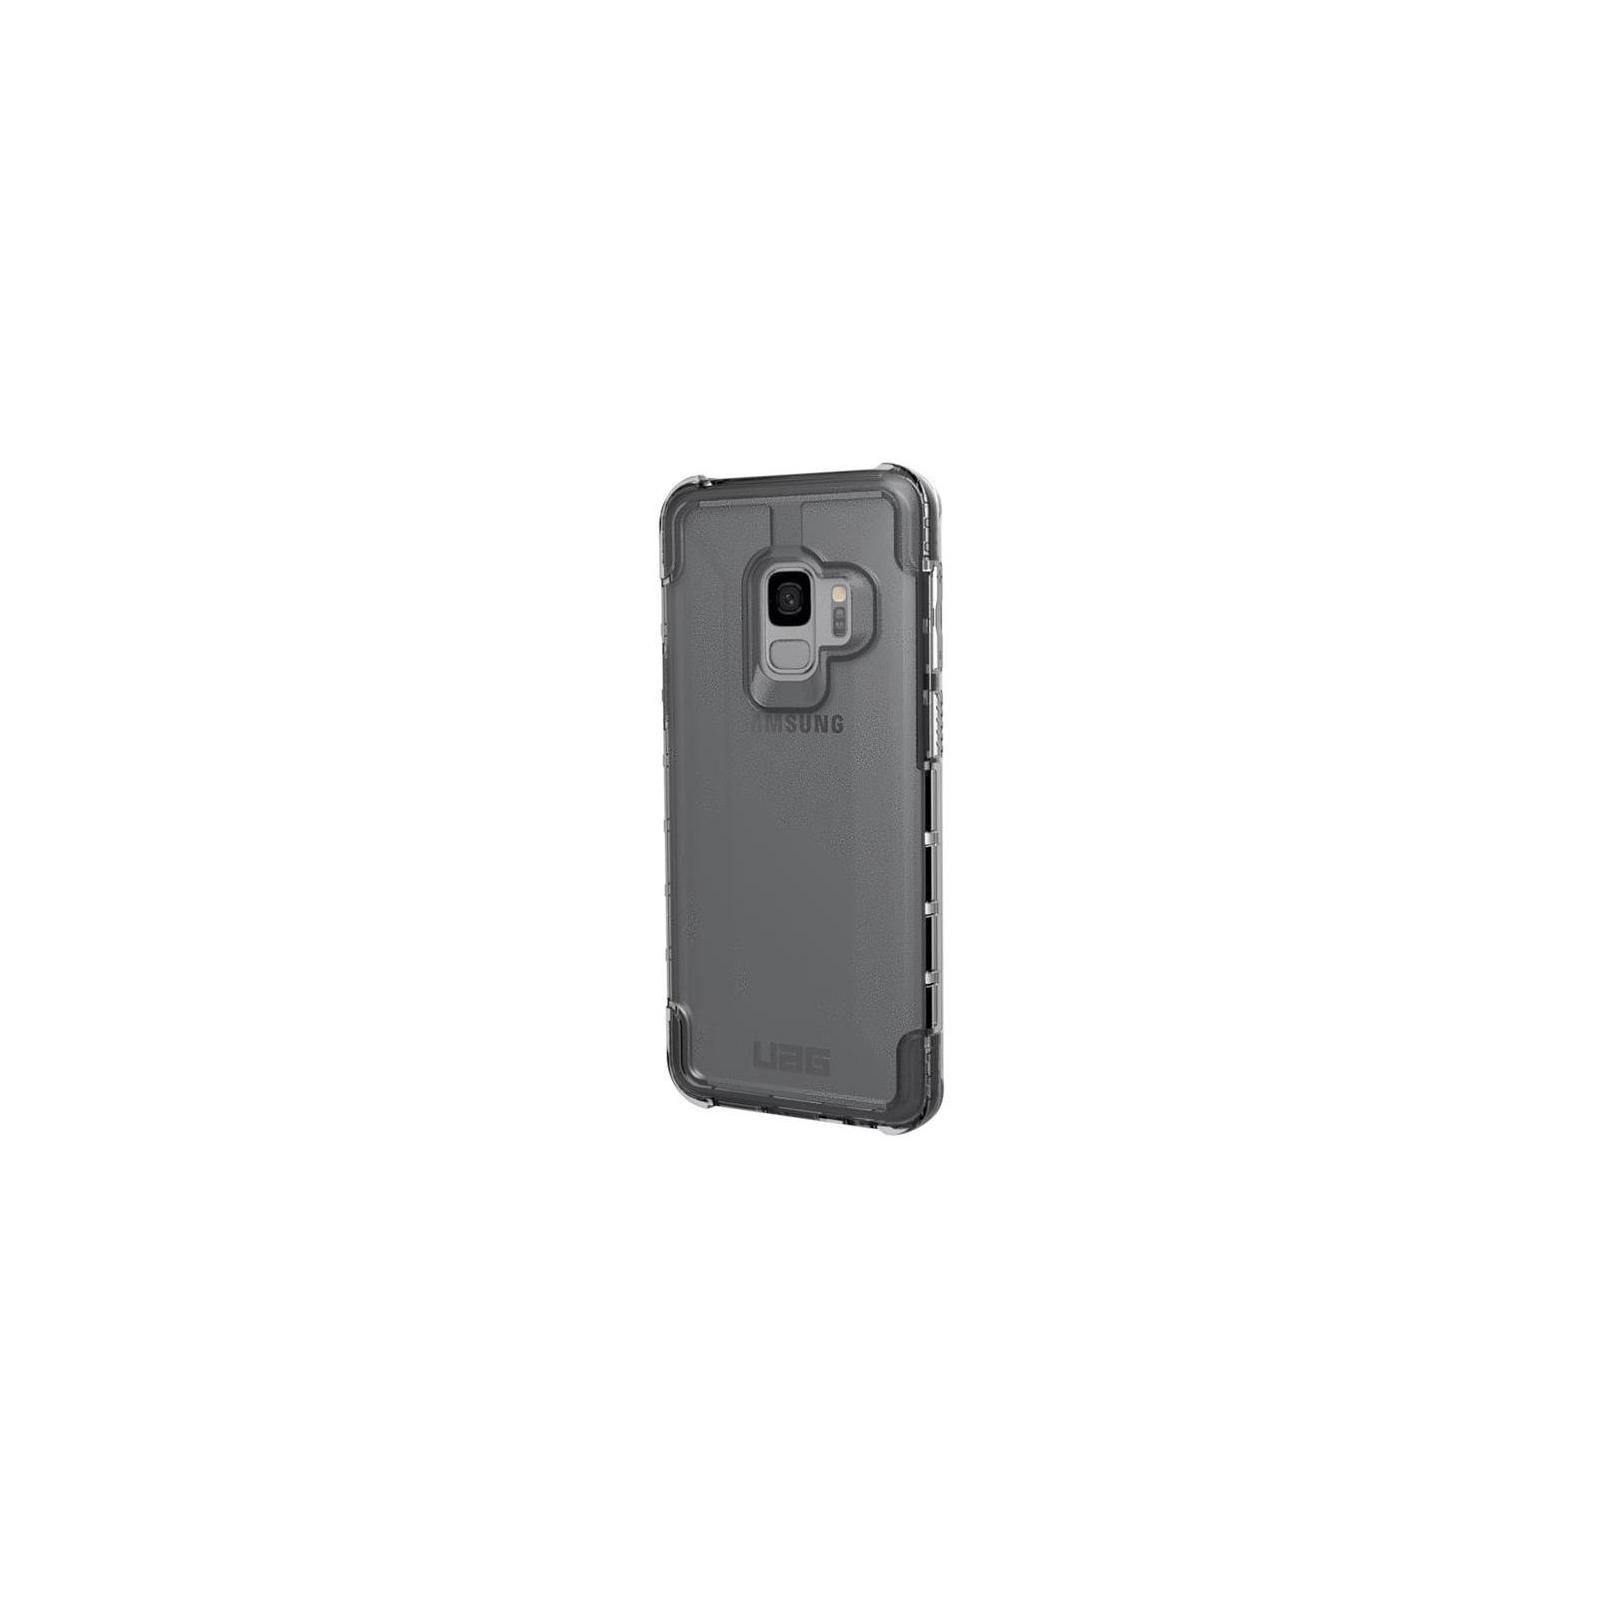 Чехол для моб. телефона Uag Galaxy S9 Plyo Ice (GLXS9-Y-IC) изображение 3